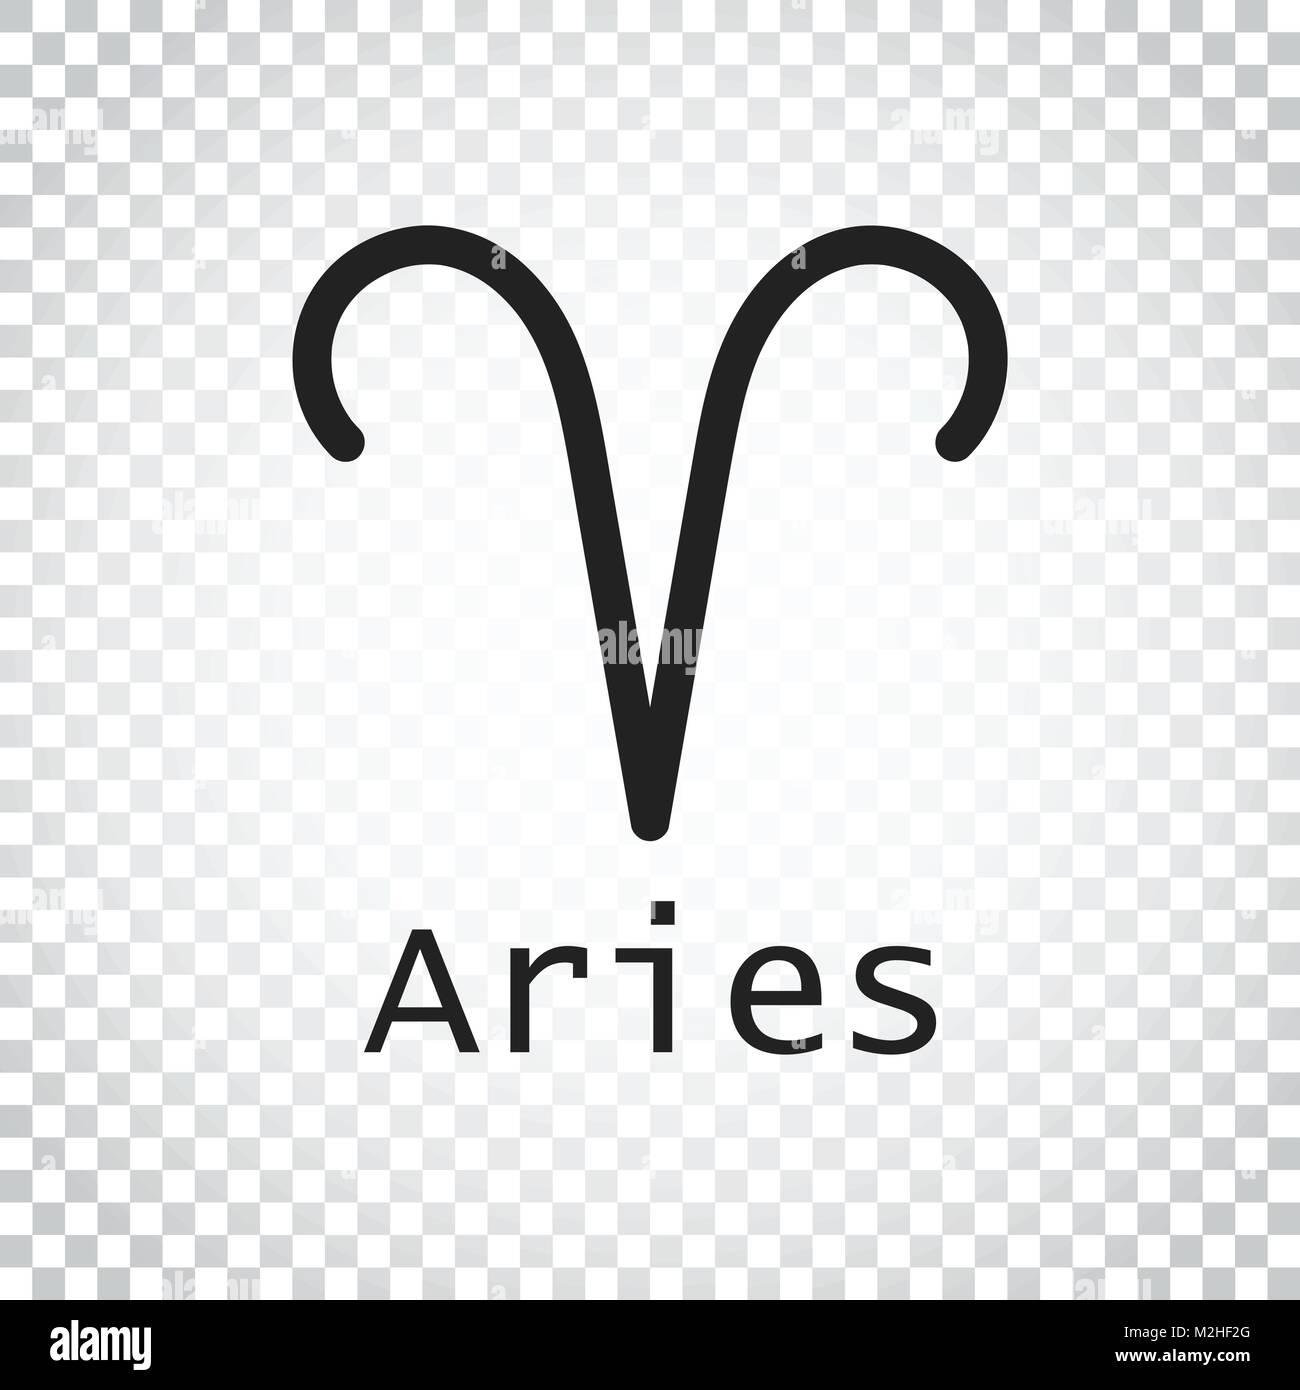 Aries Zodiac Sign Stock Photos Aries Zodiac Sign Stock